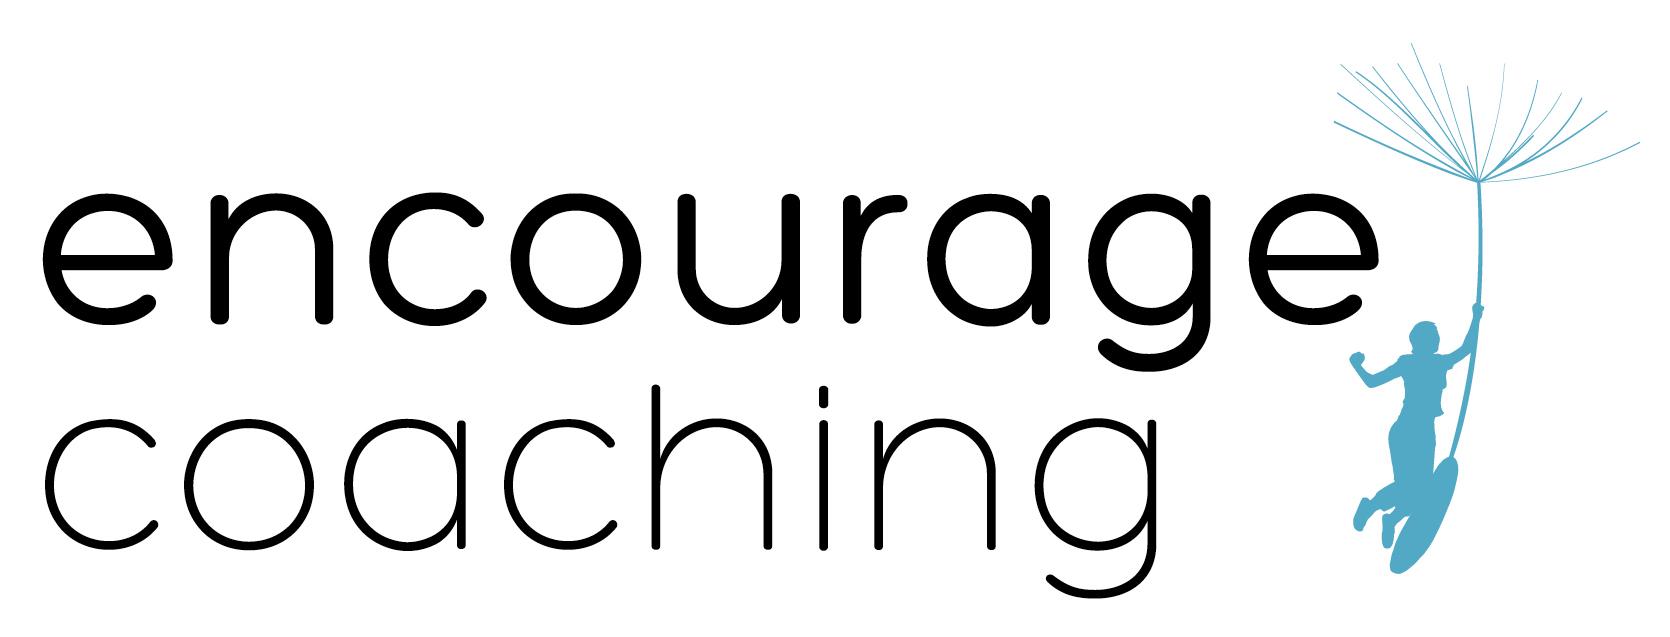 Encourage Coaching Logo